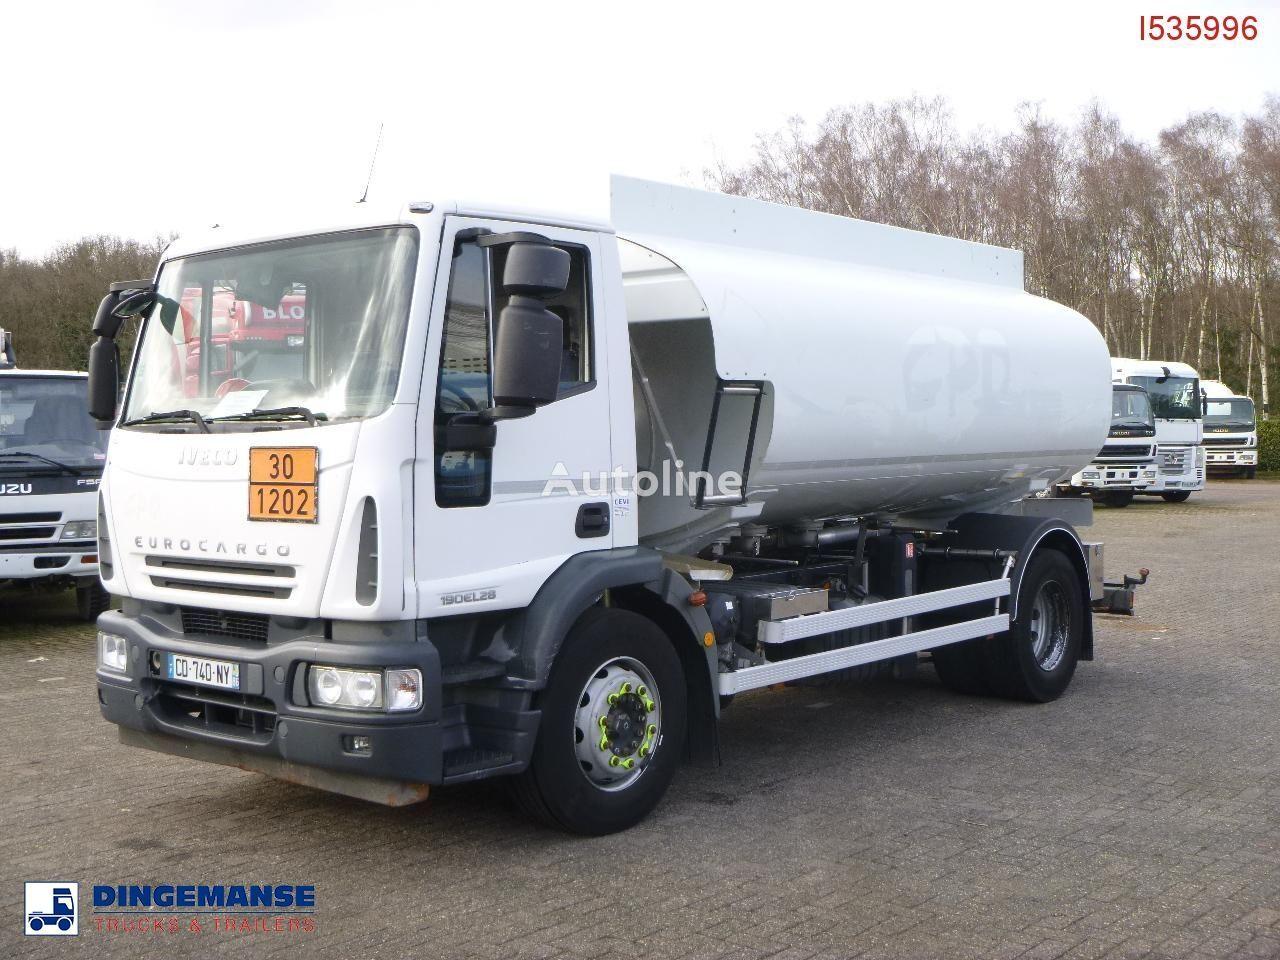 камион цистерна за горива IVECO Eurocargo ML190EL28 4x2 fuel tank 13.7 m3 / 4 comp